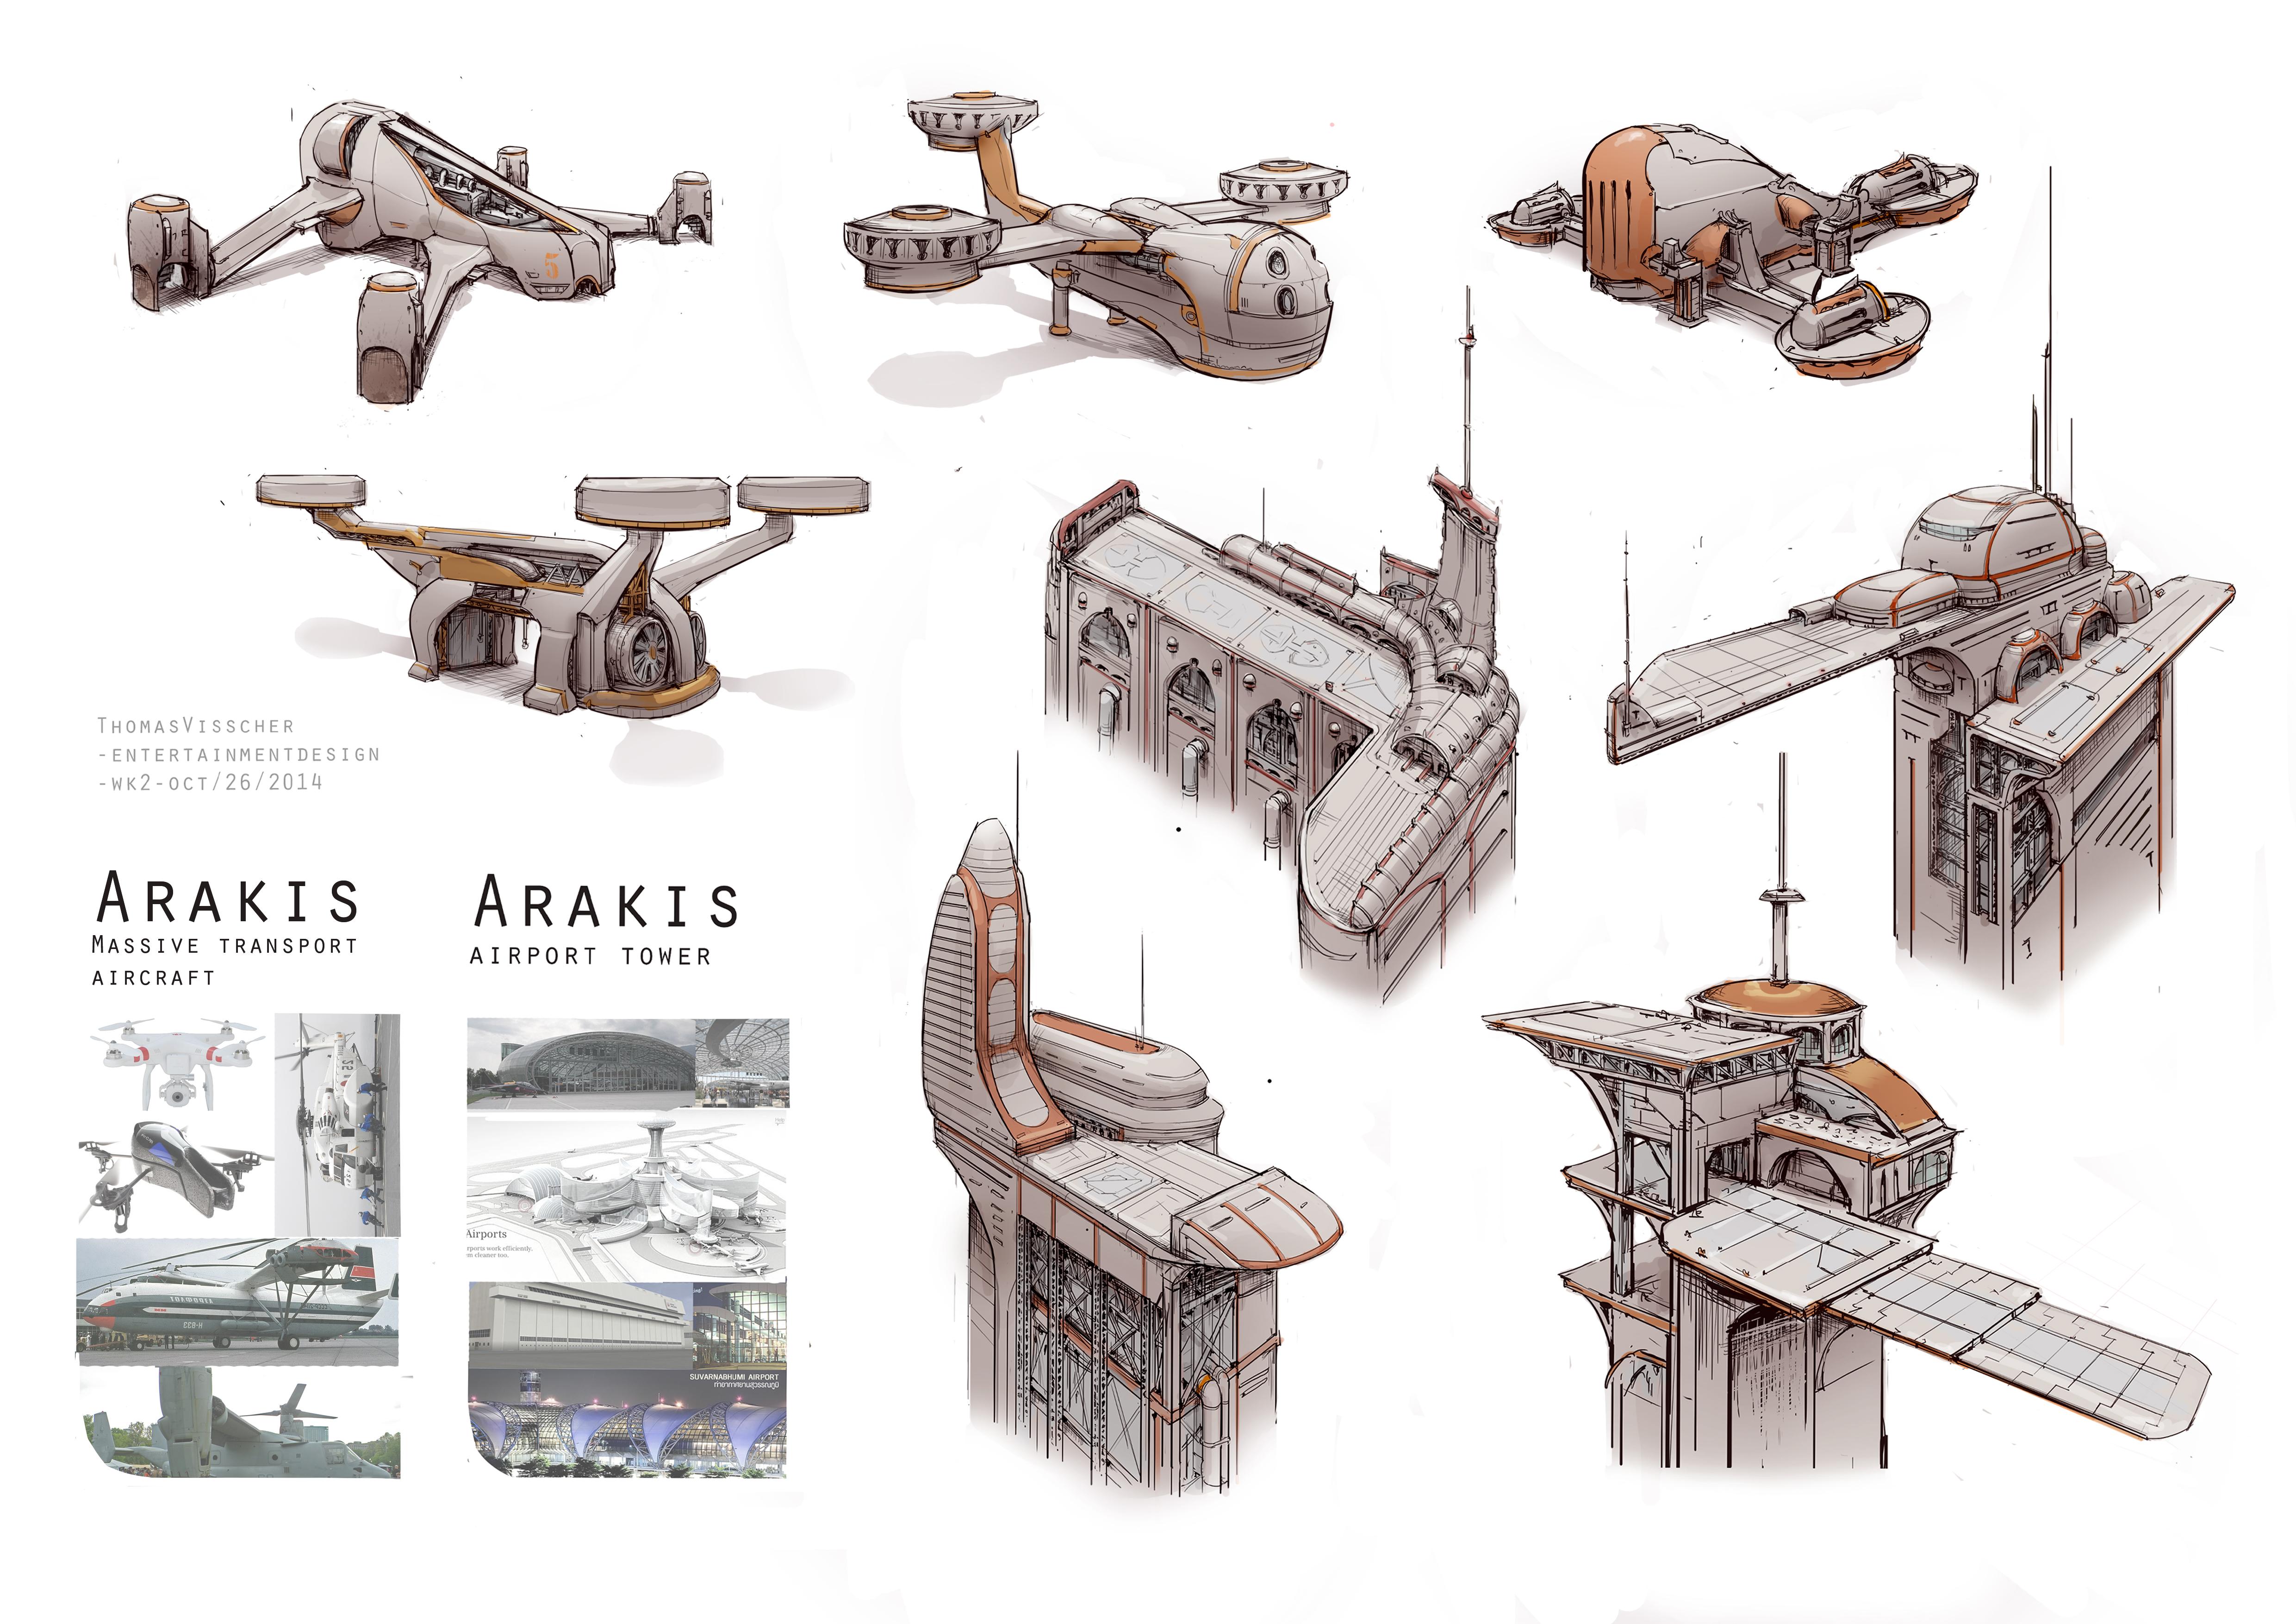 Arakis city sketches